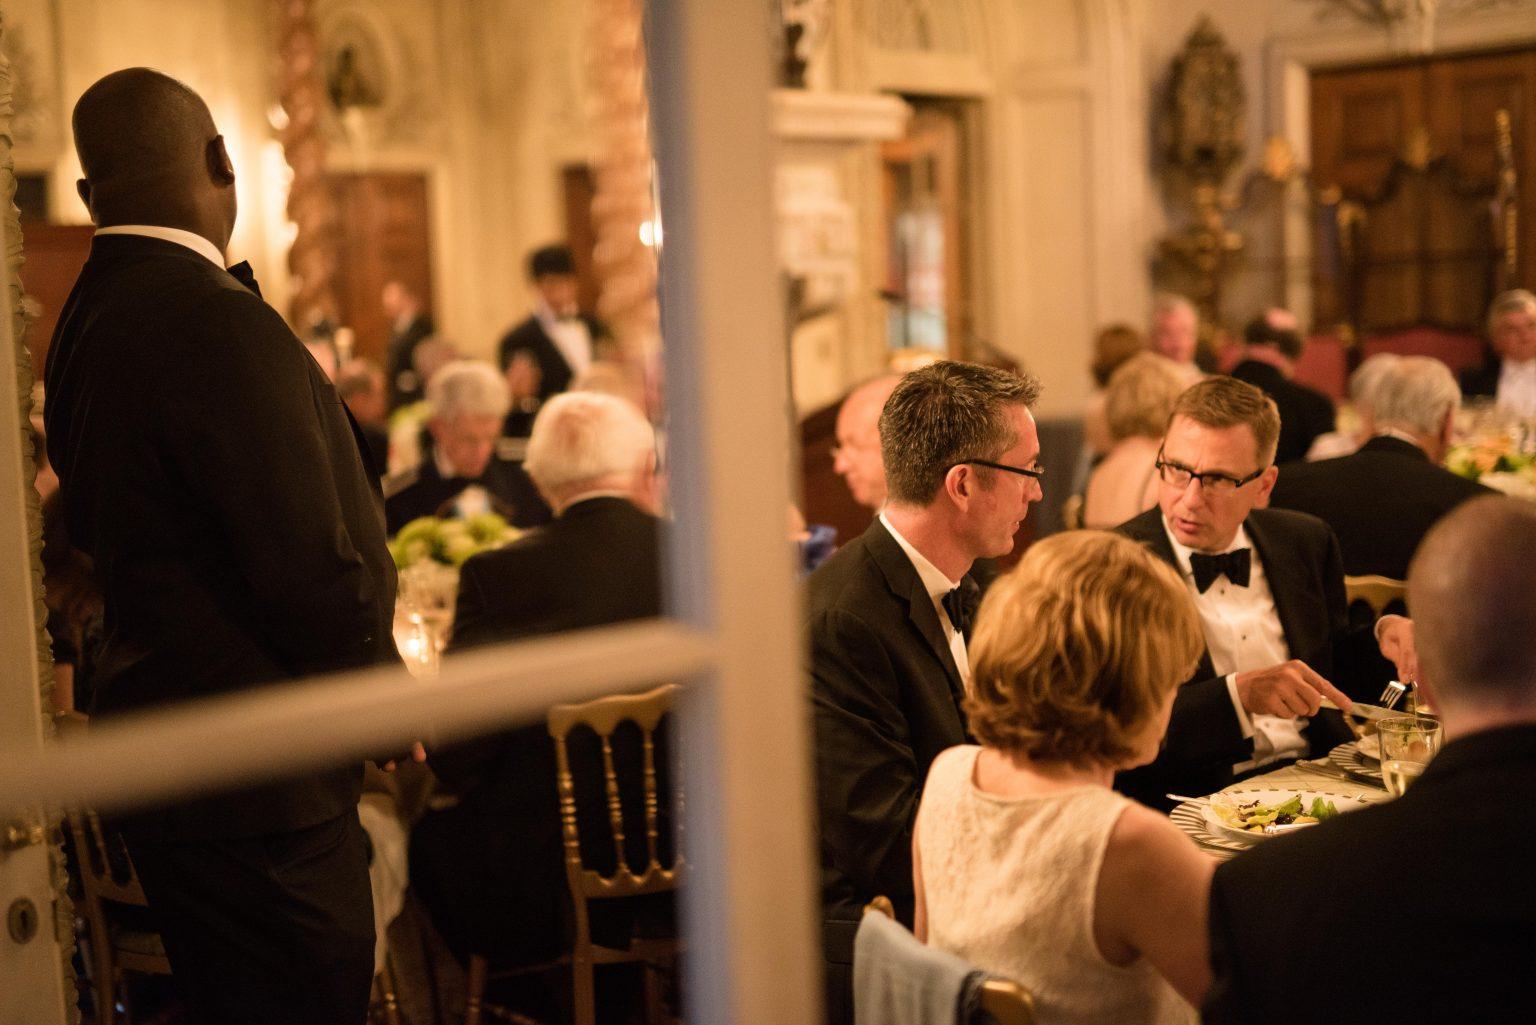 Black tie dinner in the Ballroom. Photo by Elliott O'Donovan.